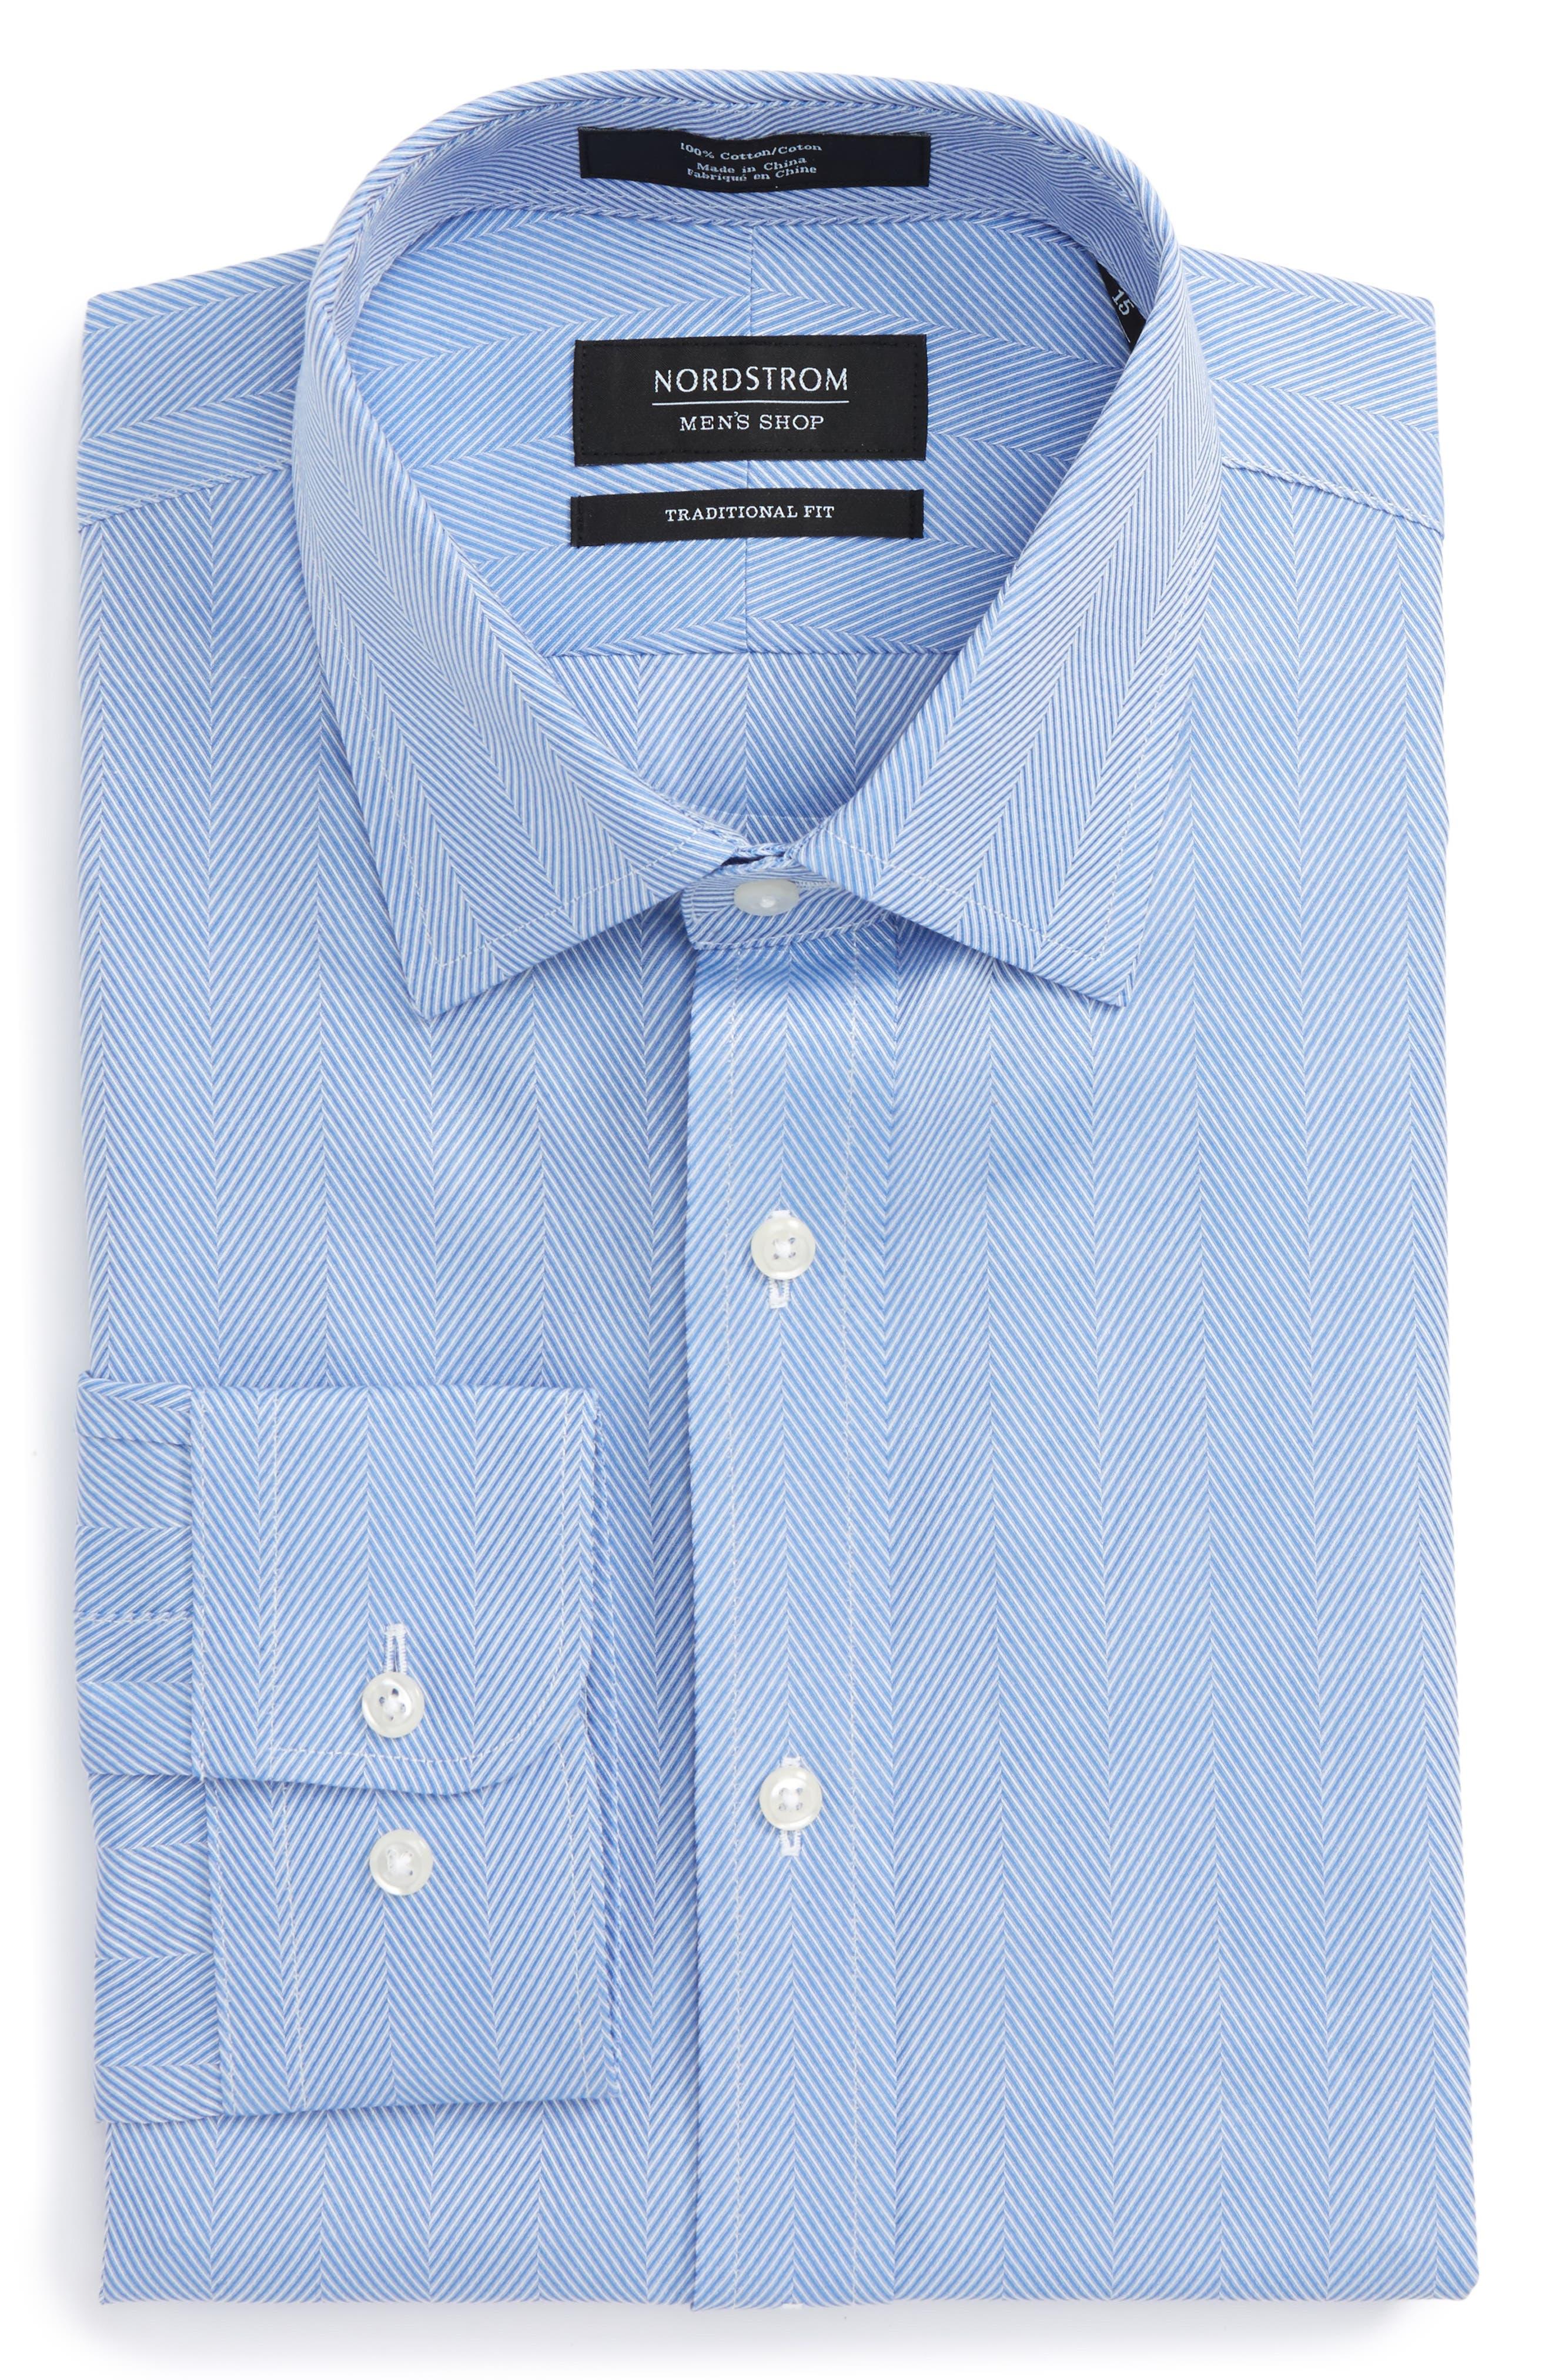 Main Image - Nordstrom Men's Shop Traditional Fit Herringbone Dress Shirt